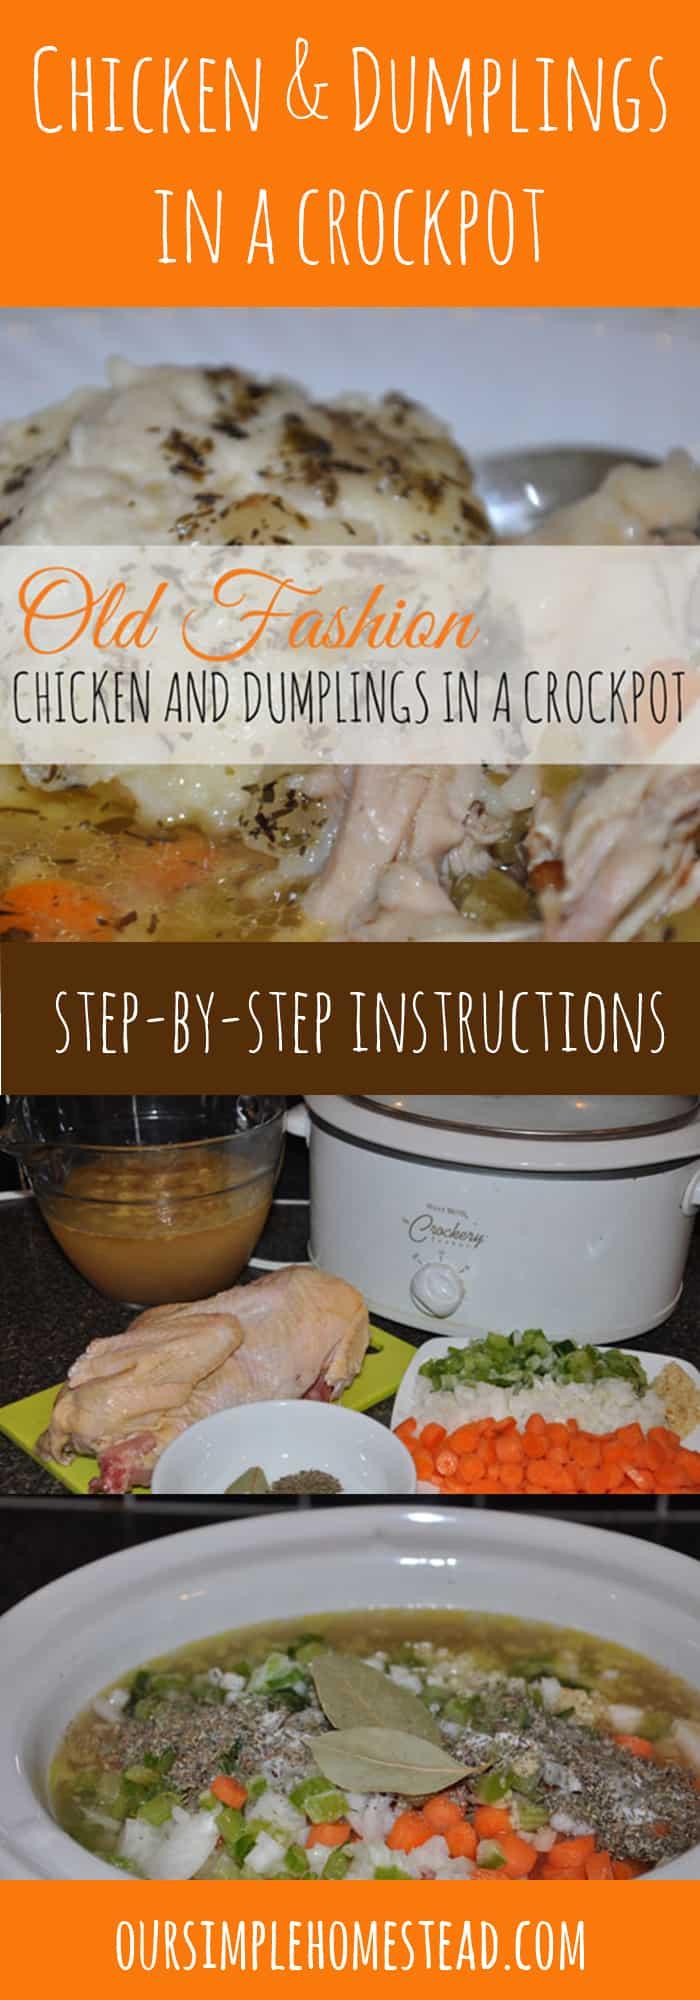 crockpot chicken and dumplings recipe